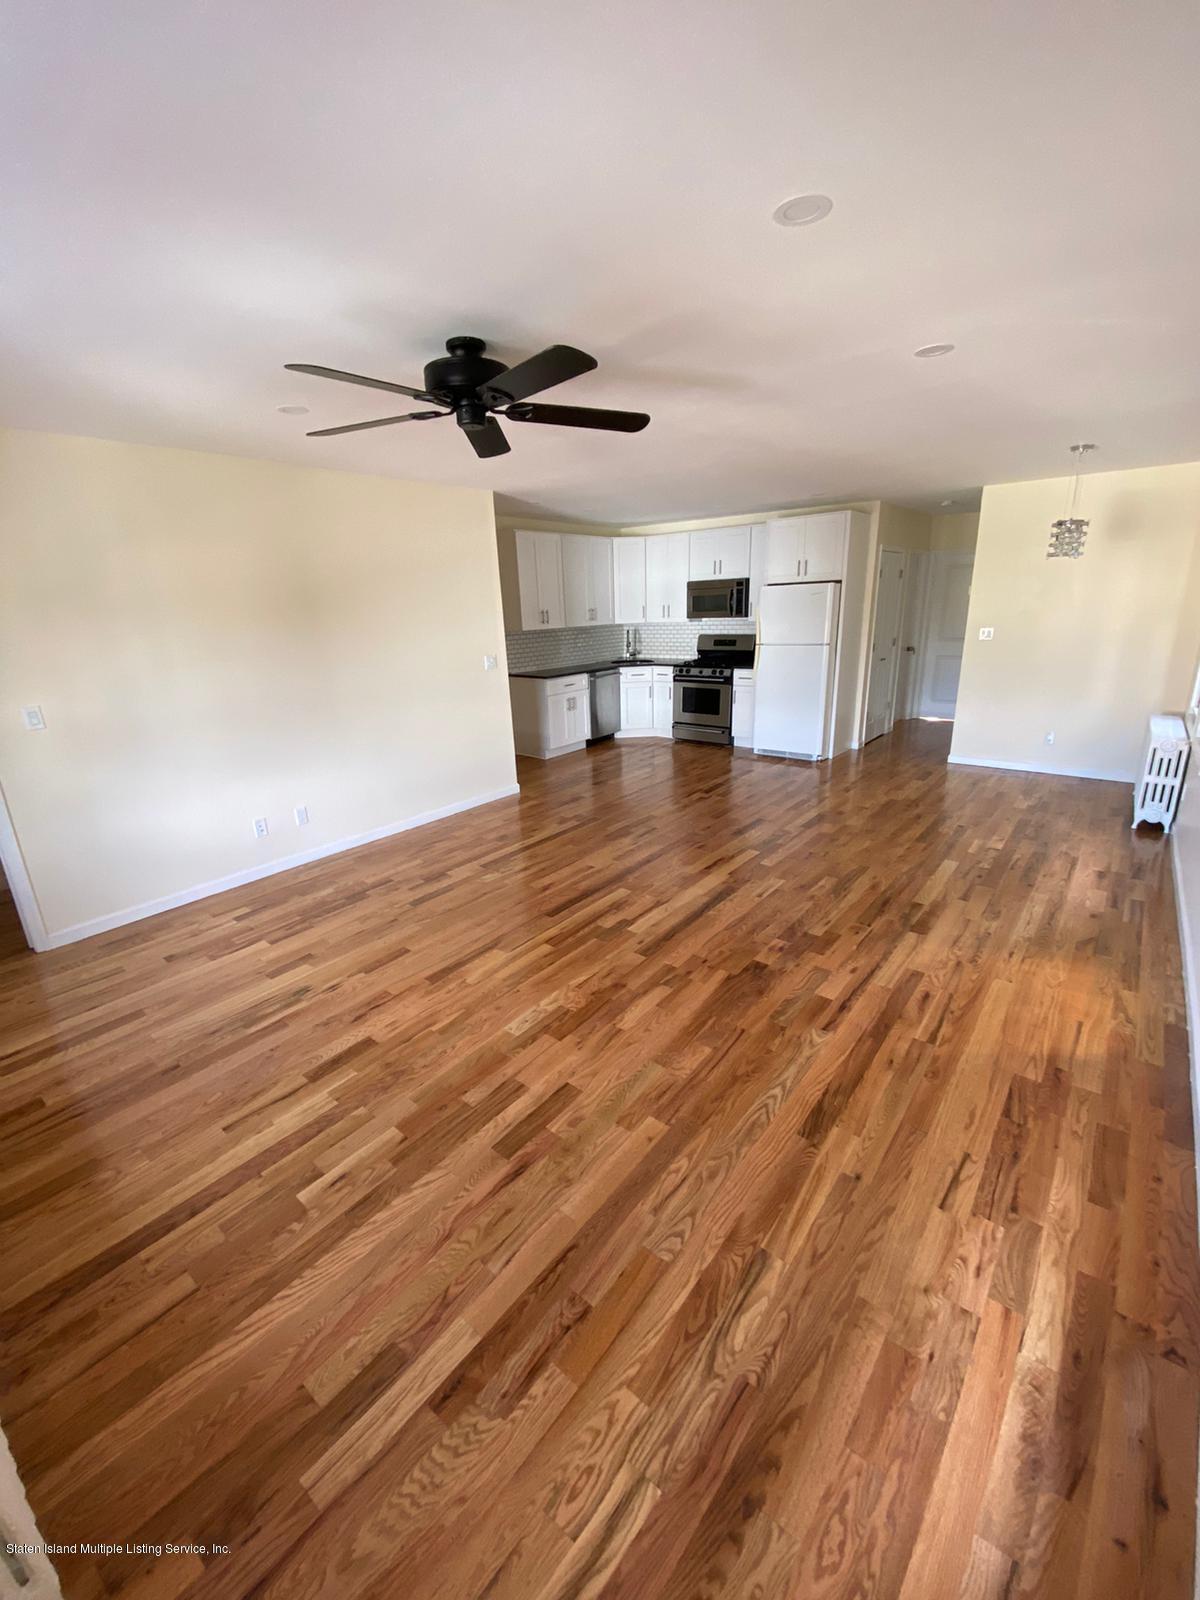 56 Taft Avenue,Staten Island,New York,10301,United States,3 Bedrooms Bedrooms,6 Rooms Rooms,1 BathroomBathrooms,Res-Rental,Taft,1134316